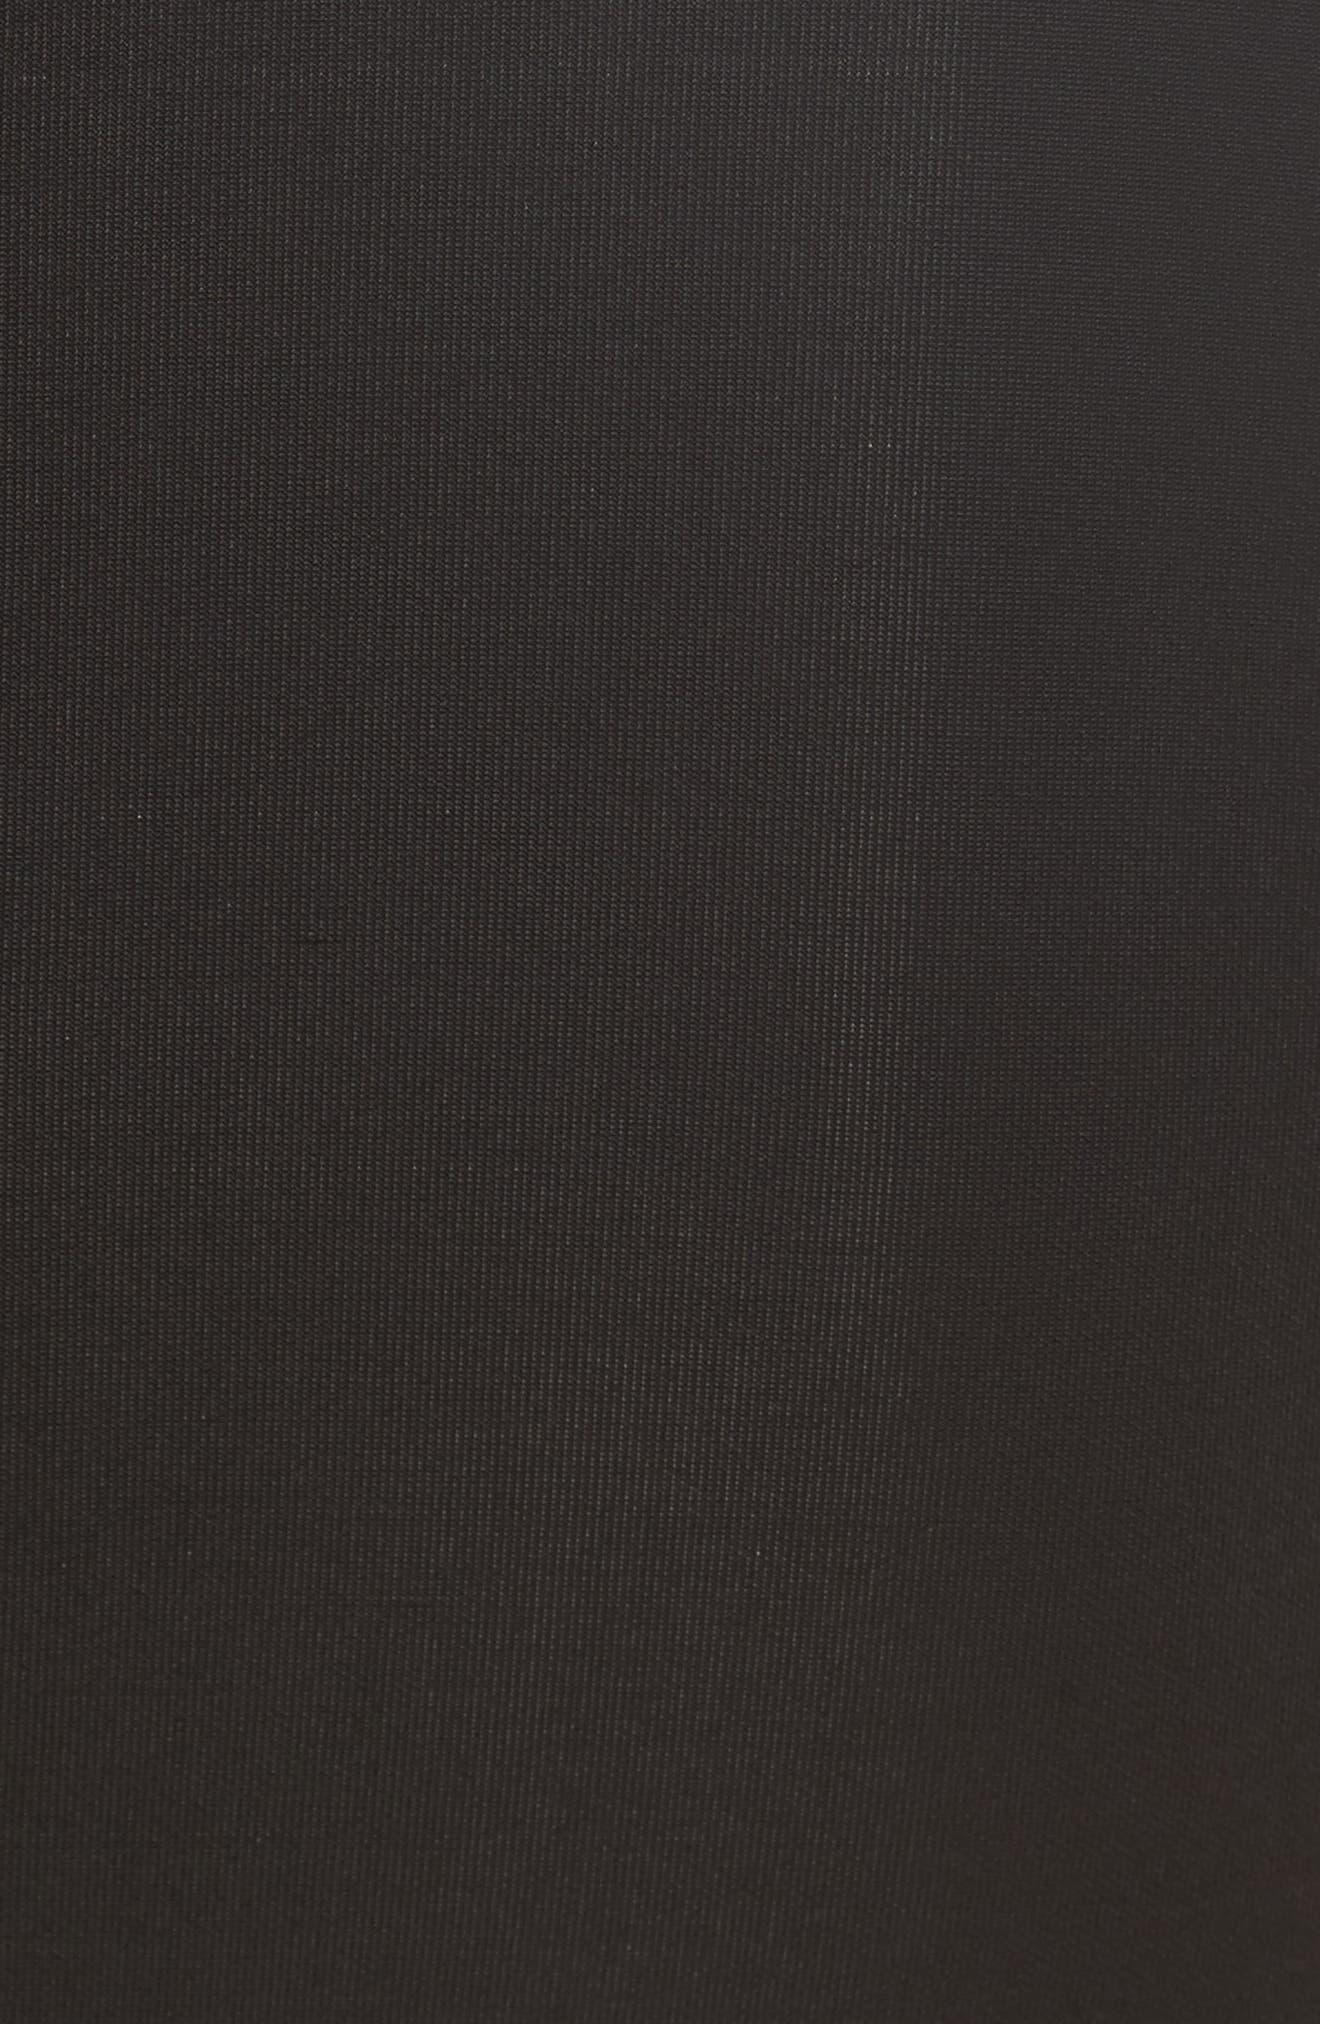 Bondage Jersey Leather Neck Top,                             Alternate thumbnail 5, color,                             001